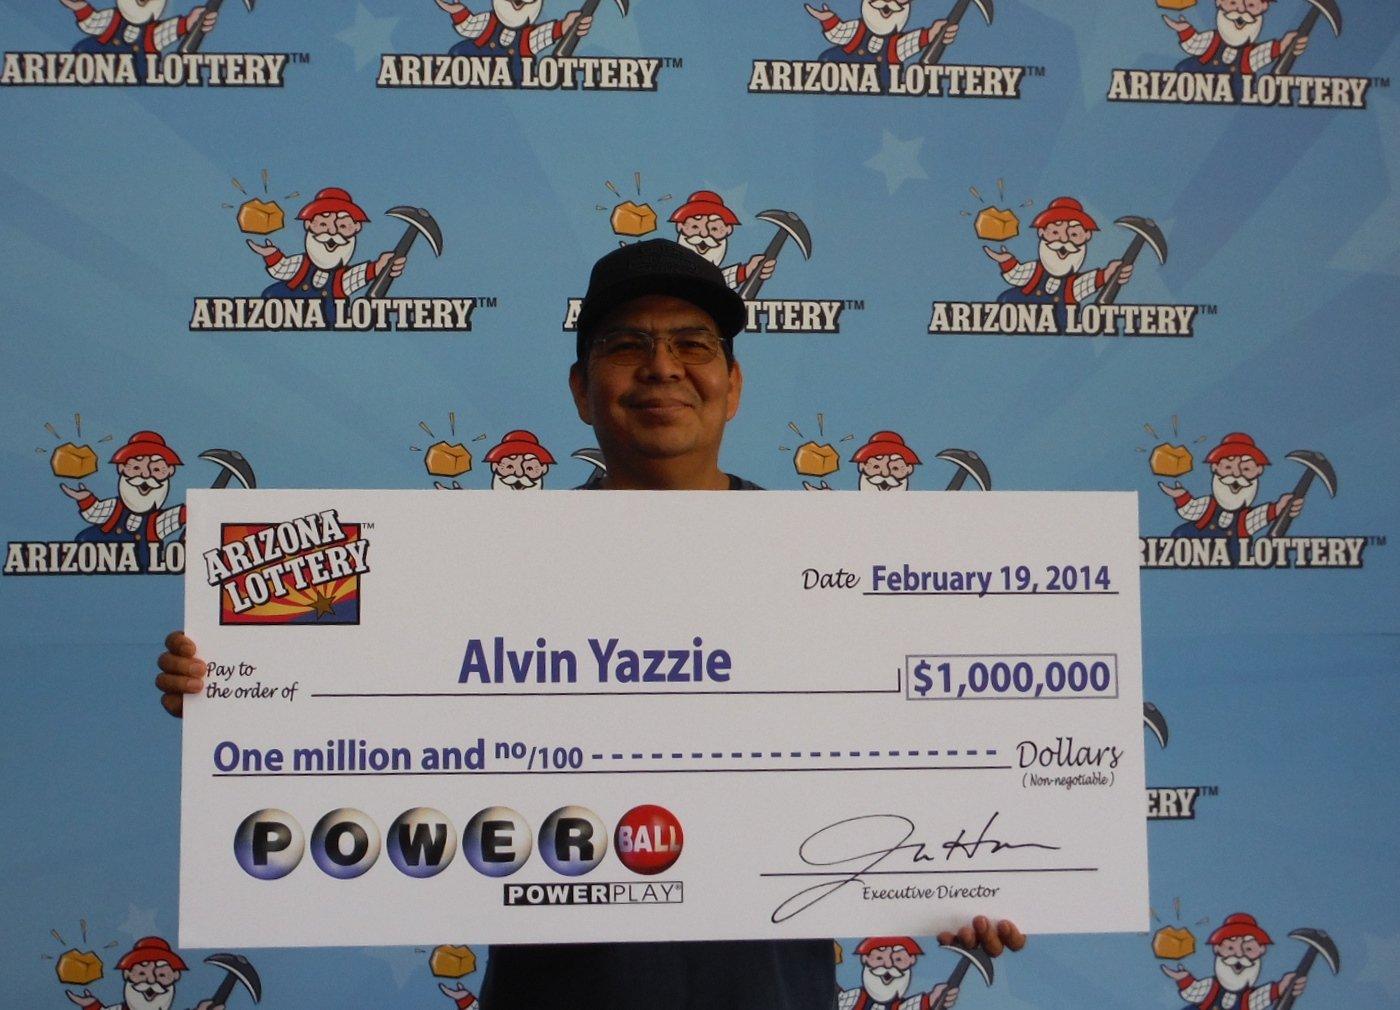 (Source: Arizona Lottery)